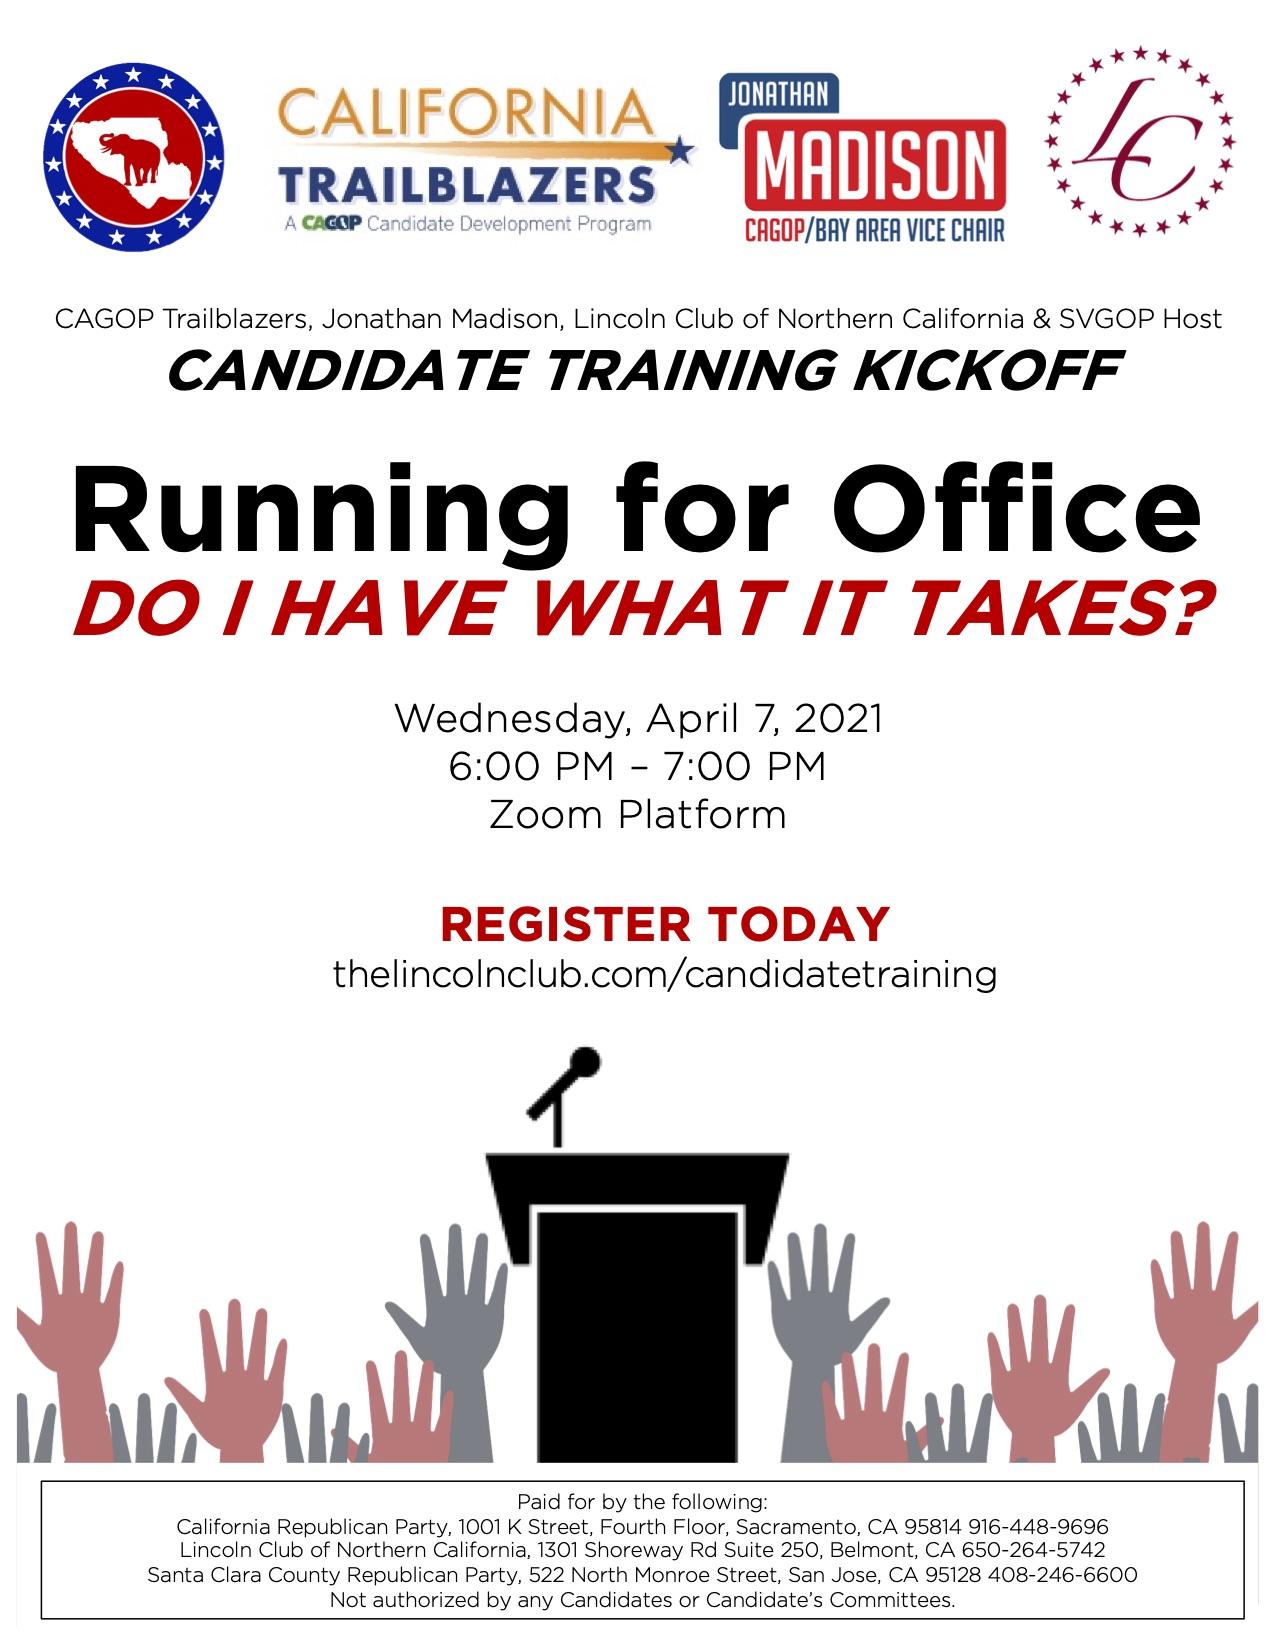 Candidate Training